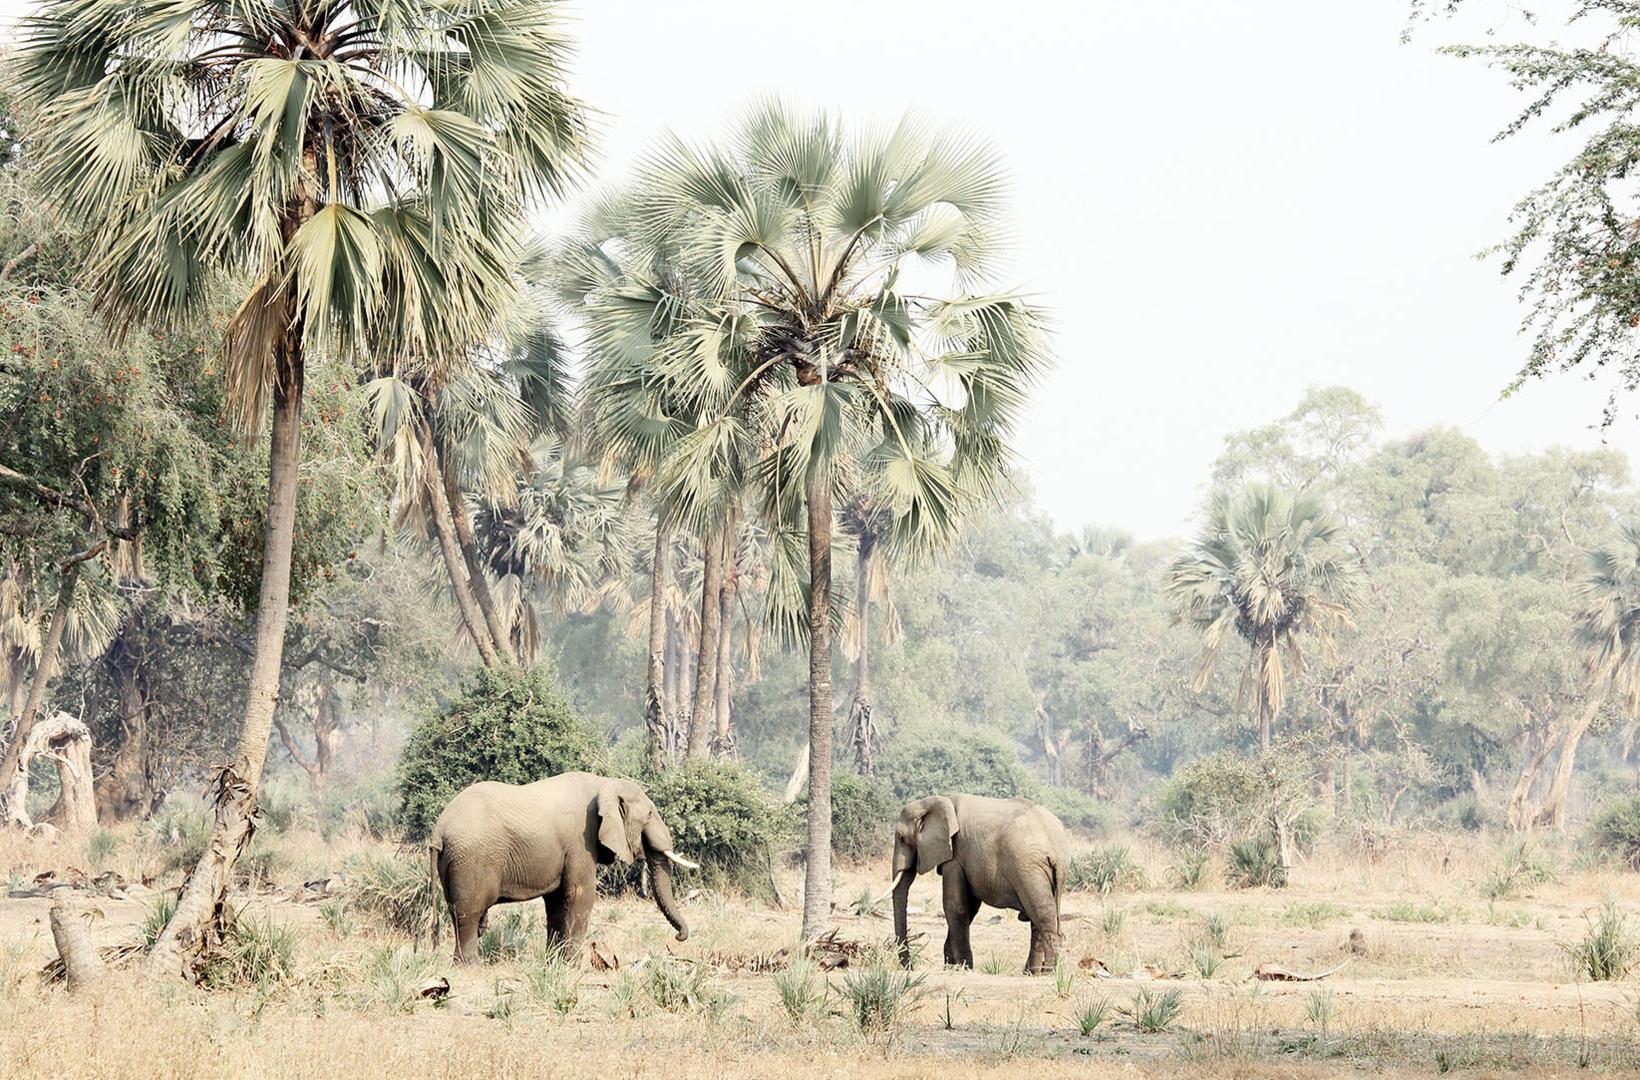 Two African elephants mill around Lala palms in Lower Zambezi Zambia, foraging for fallen date nuts